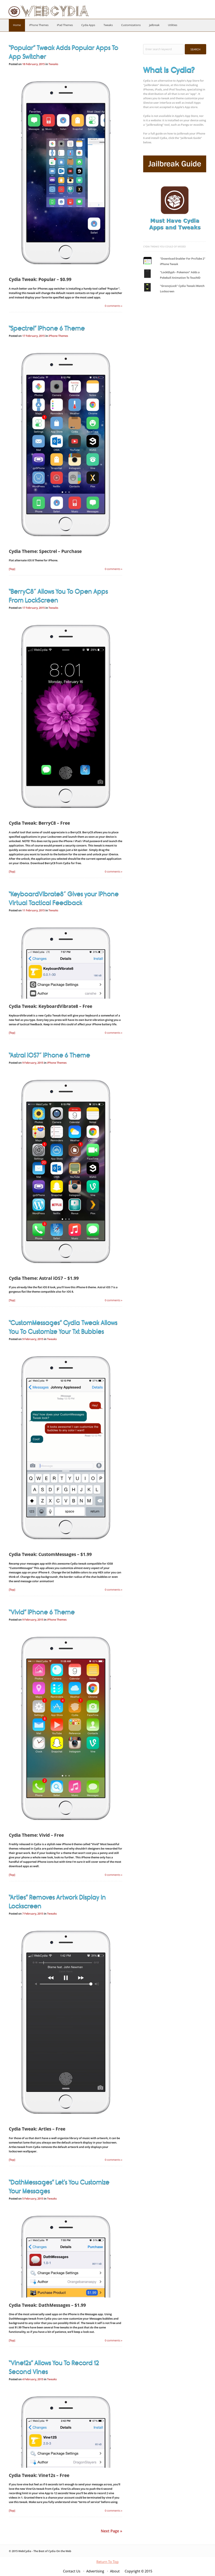 "Download ""tubeselector. Deb"" | cydia crawler | download free."